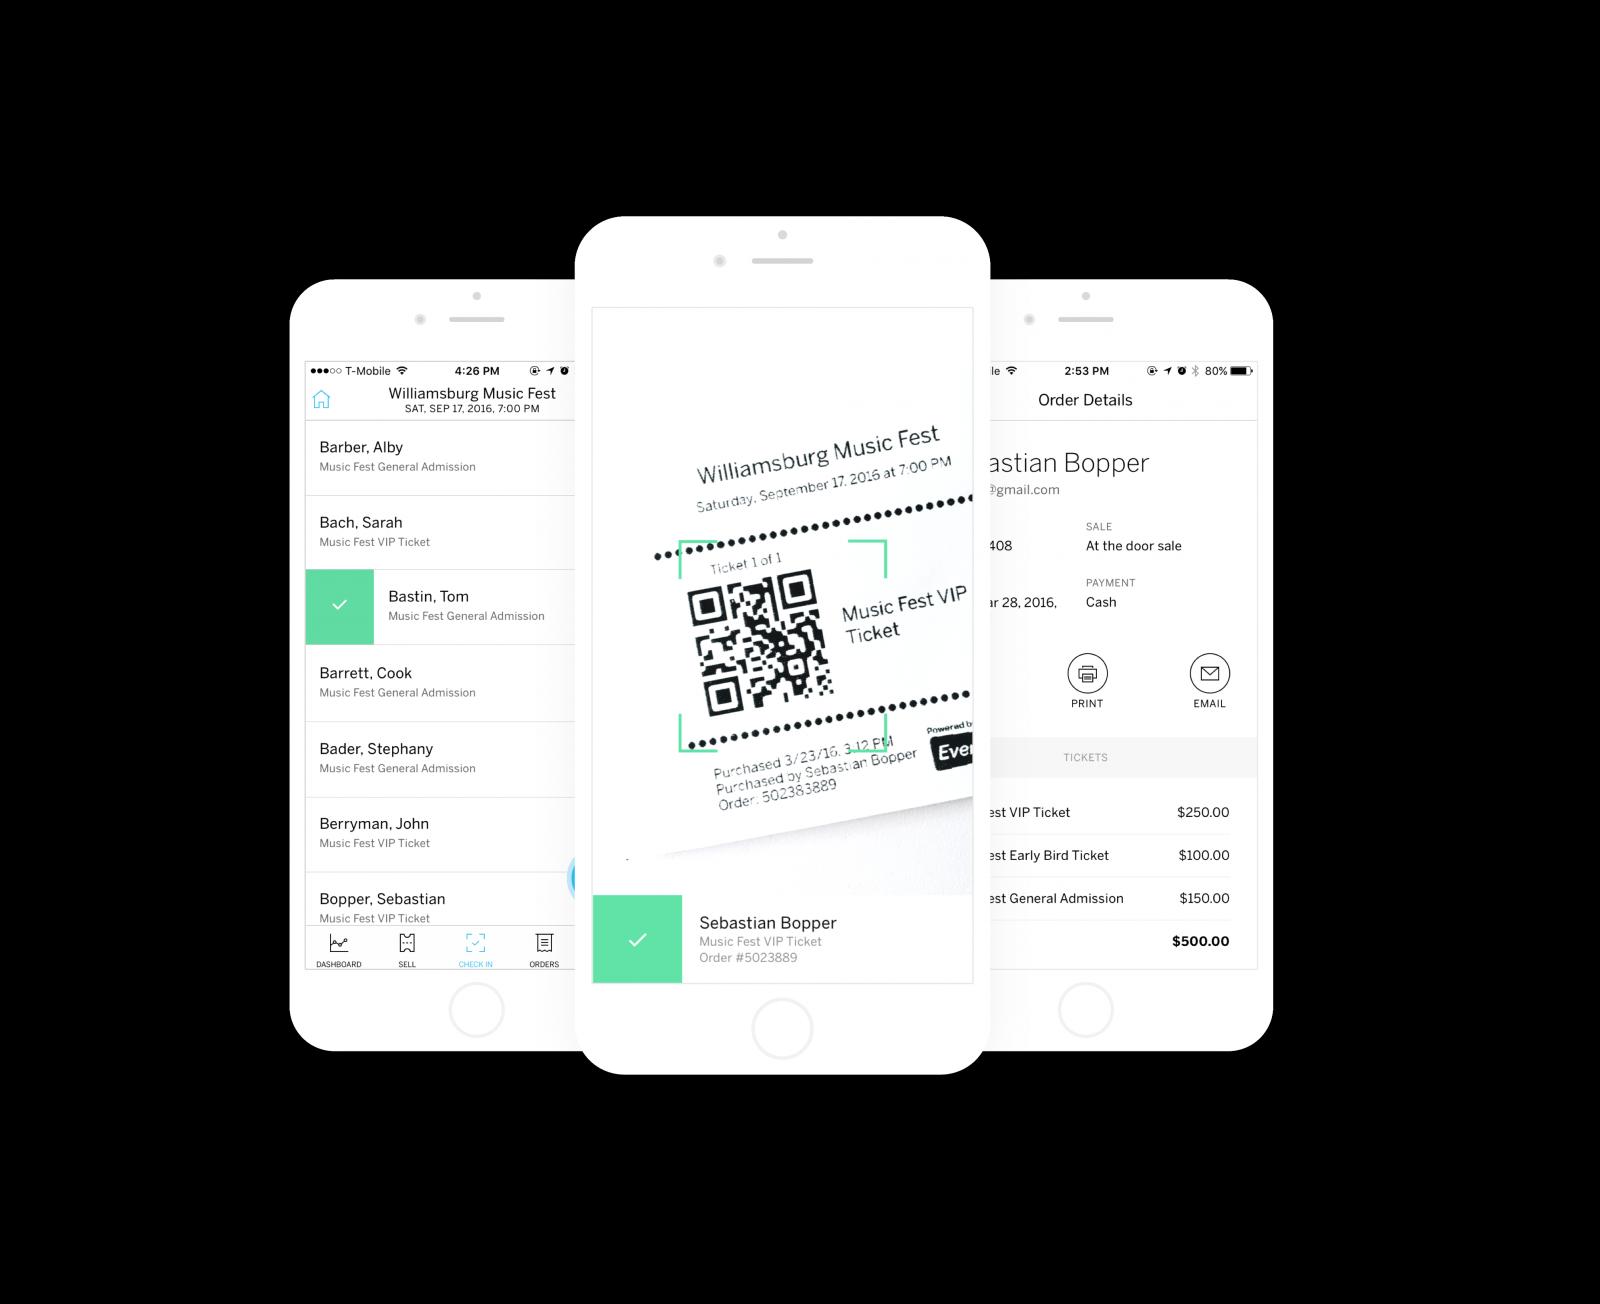 Organiser-App-Check-in1-1600x1304